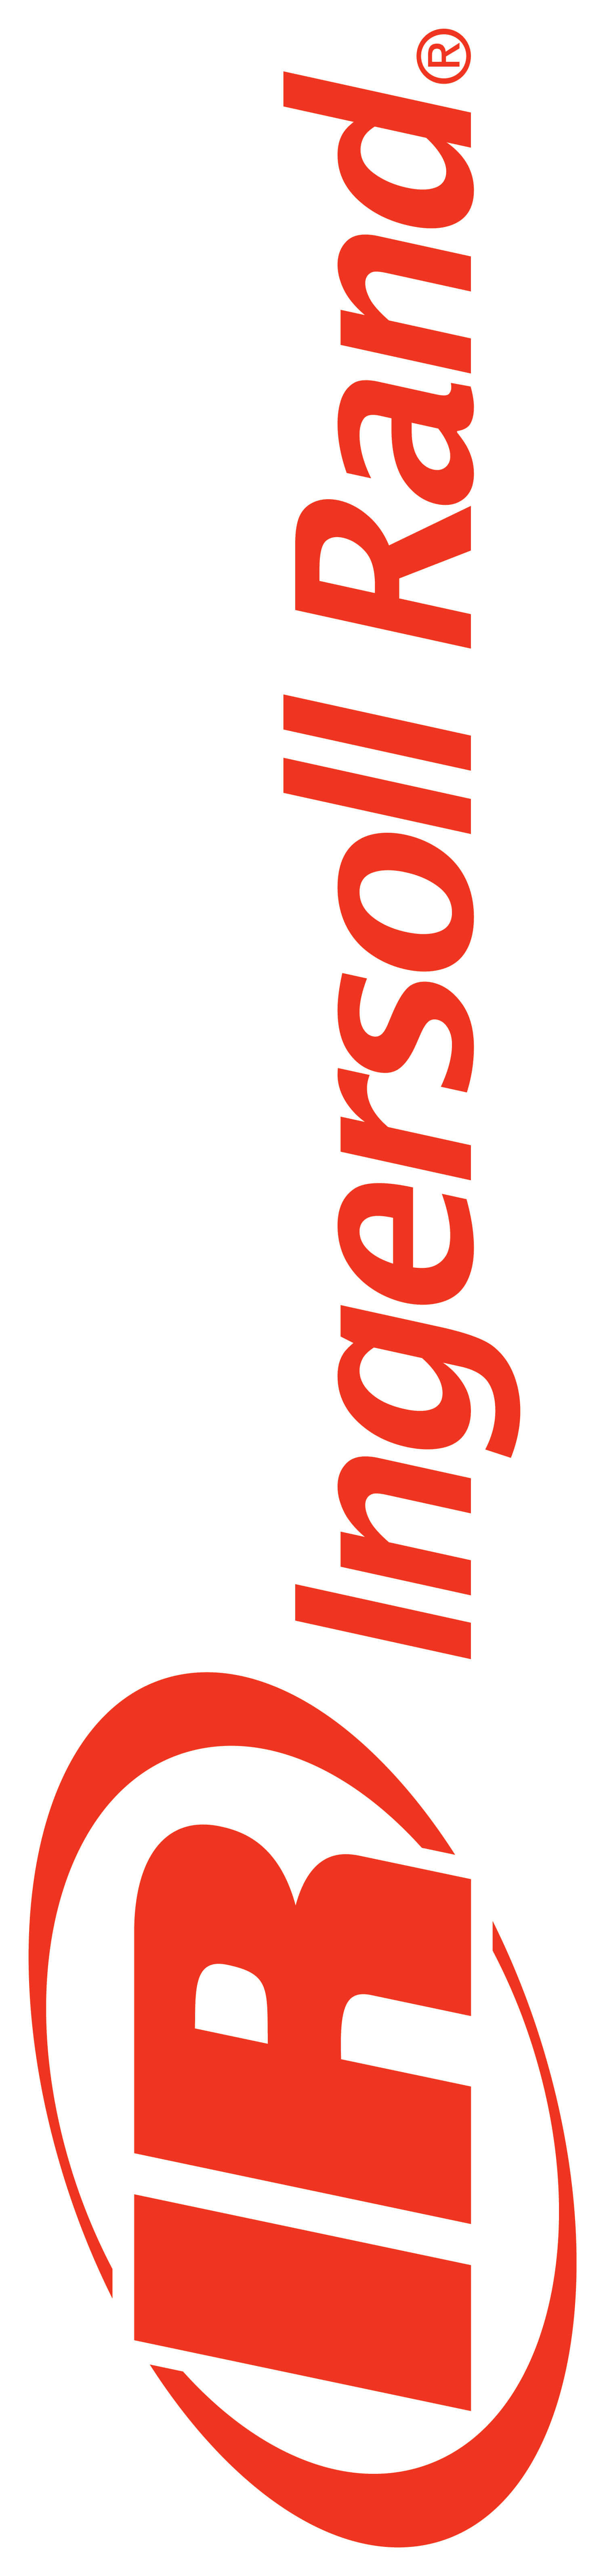 ir-logo1-1.jpg